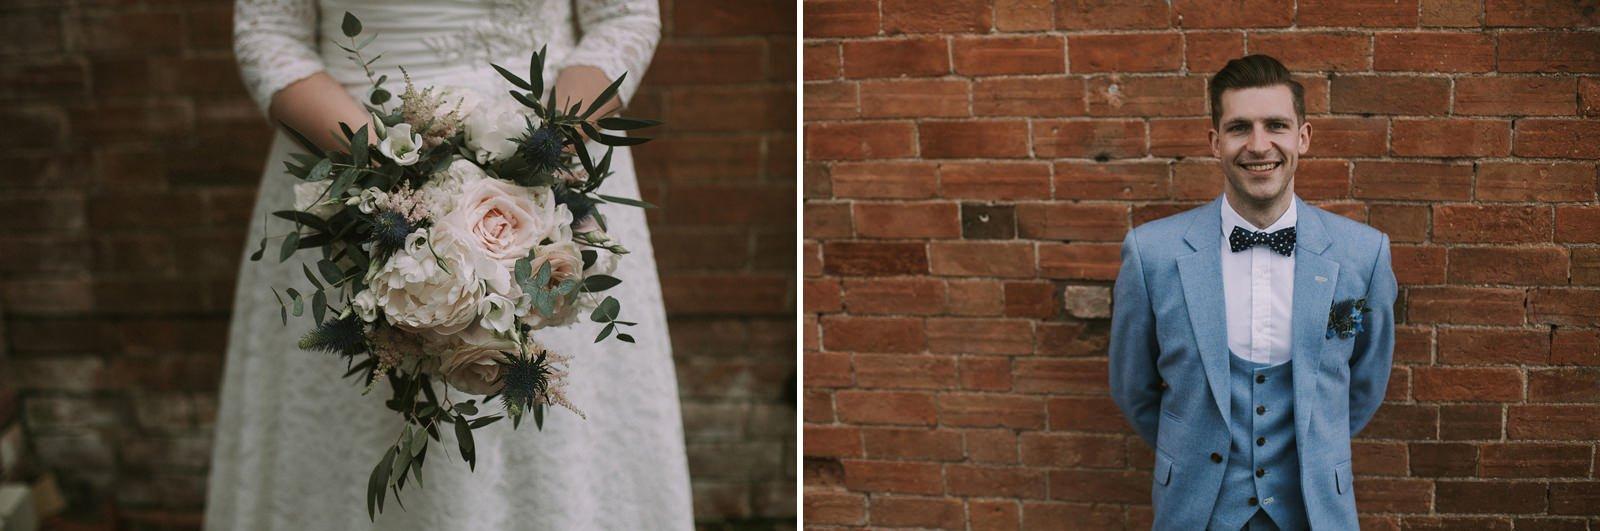 rustic wedding warwick